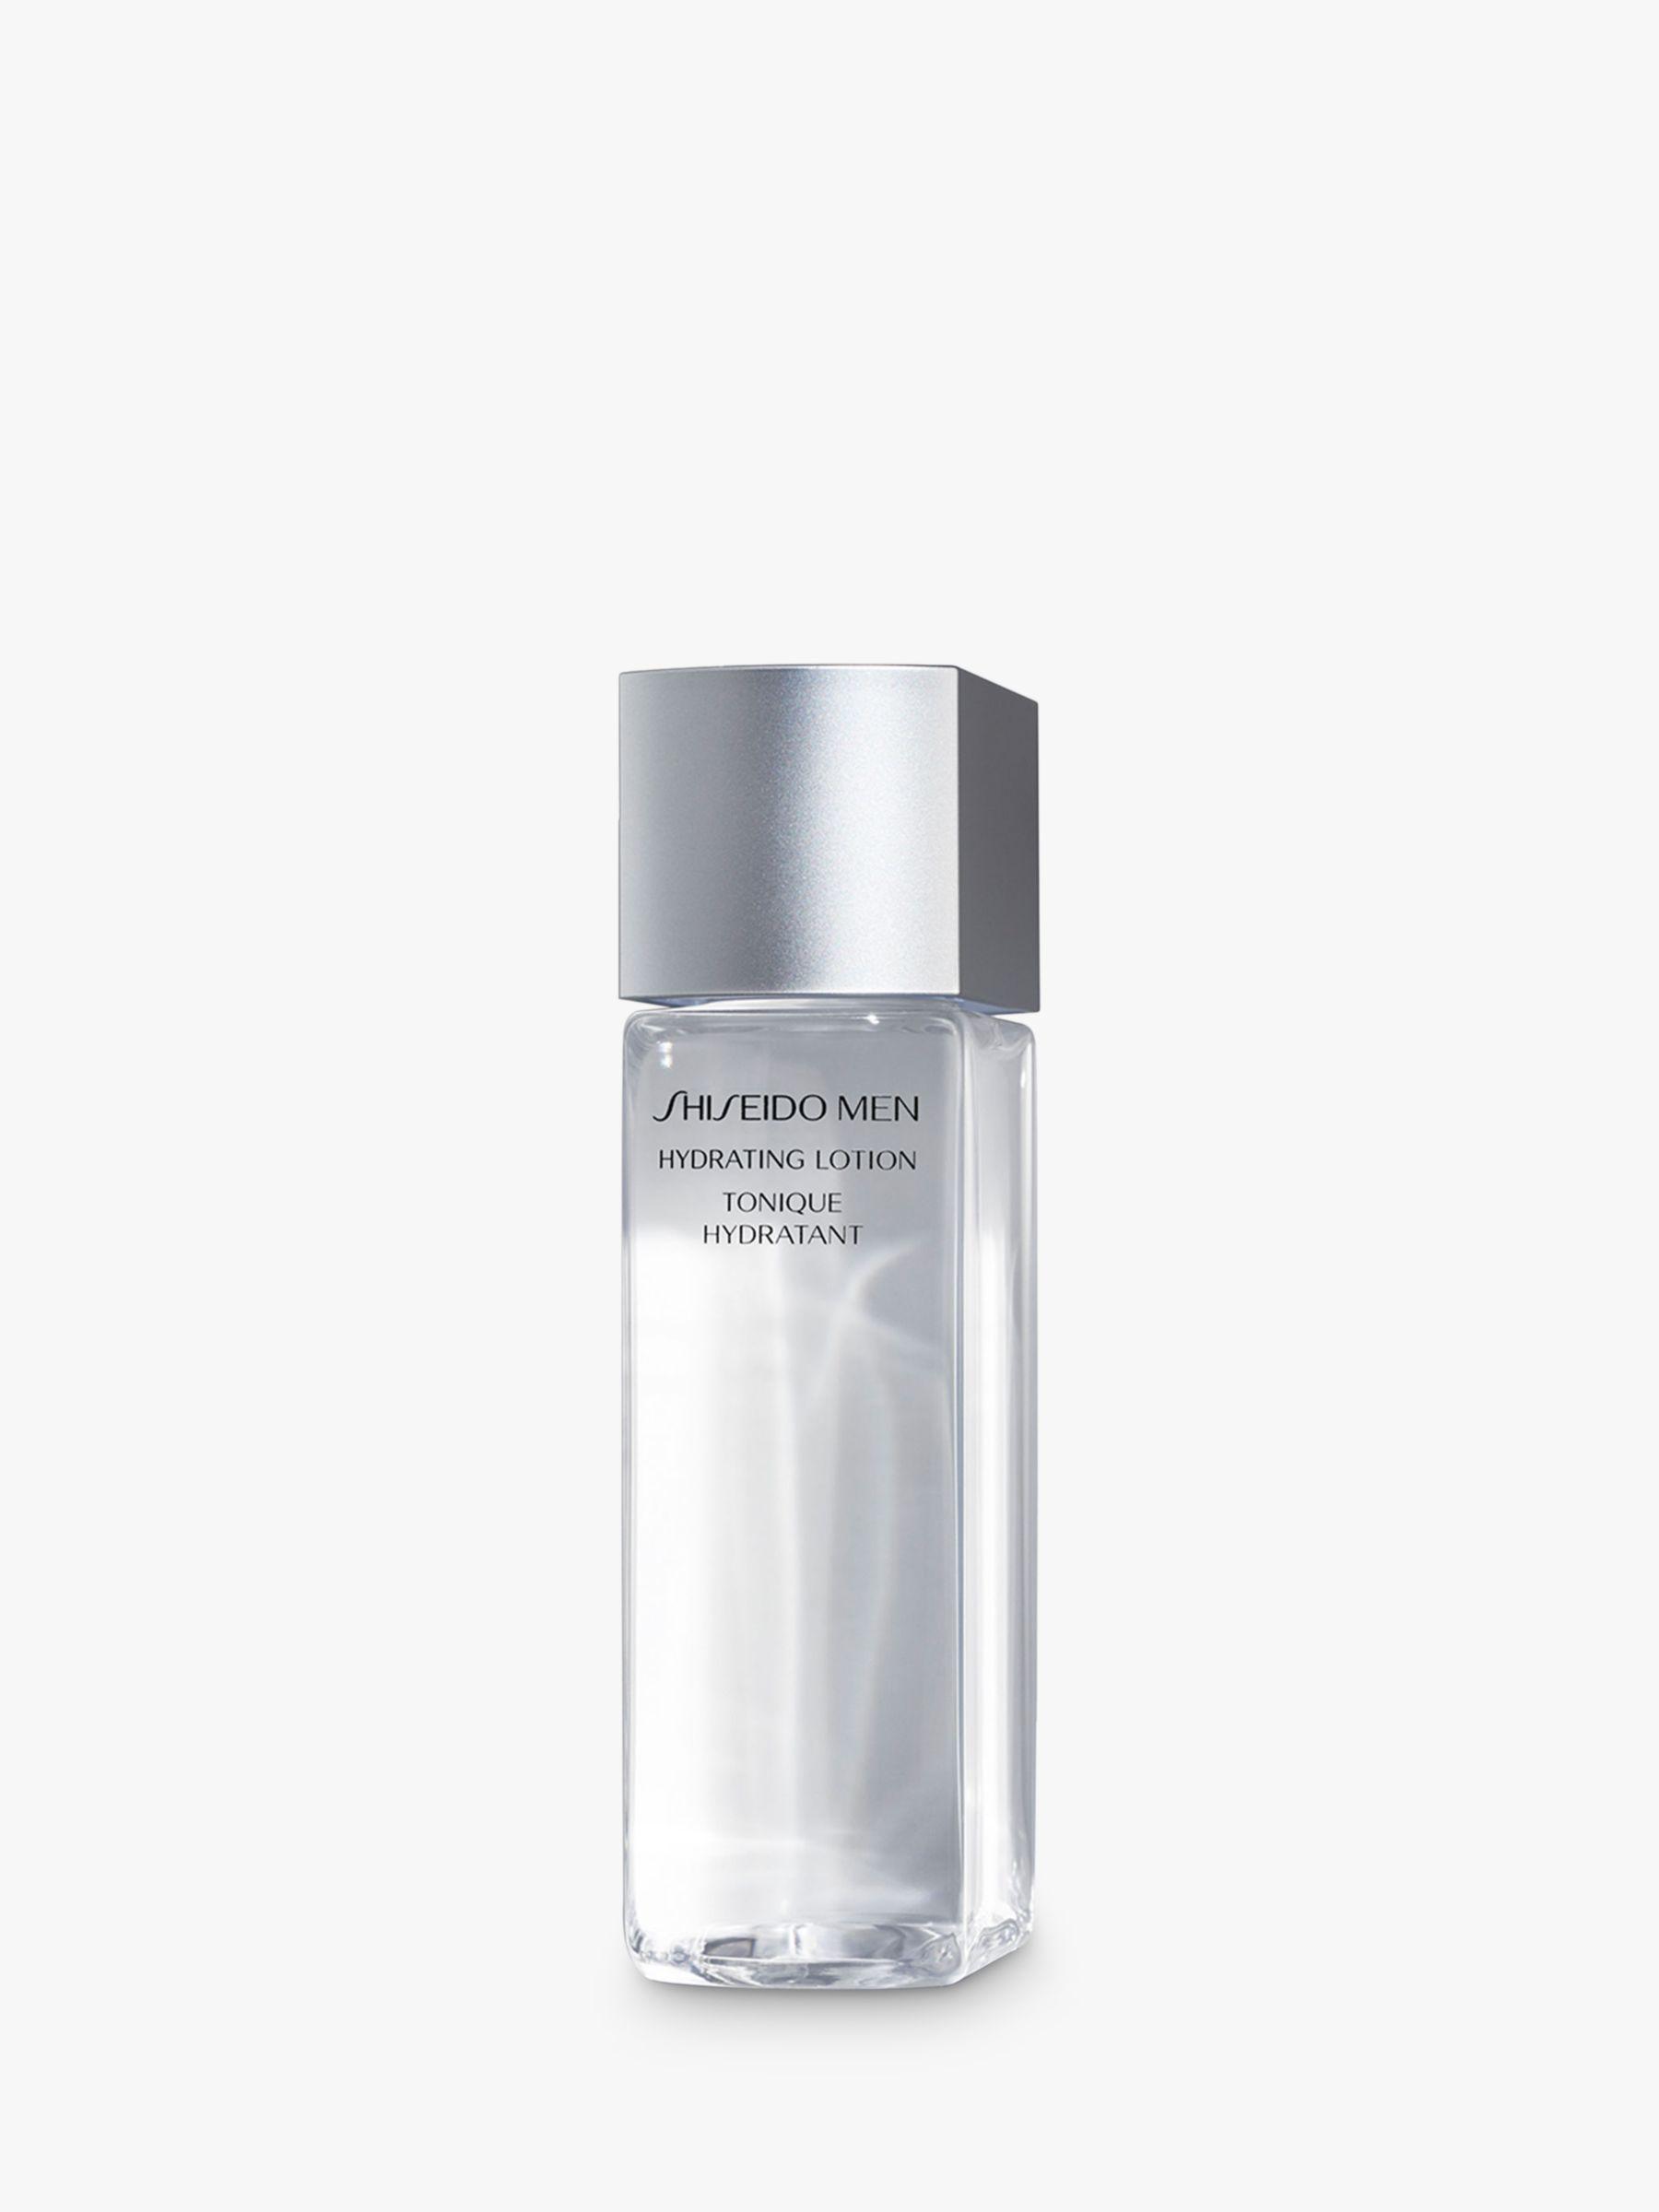 Shiseido Shiseido Men Hydrating Lotion, 150ml